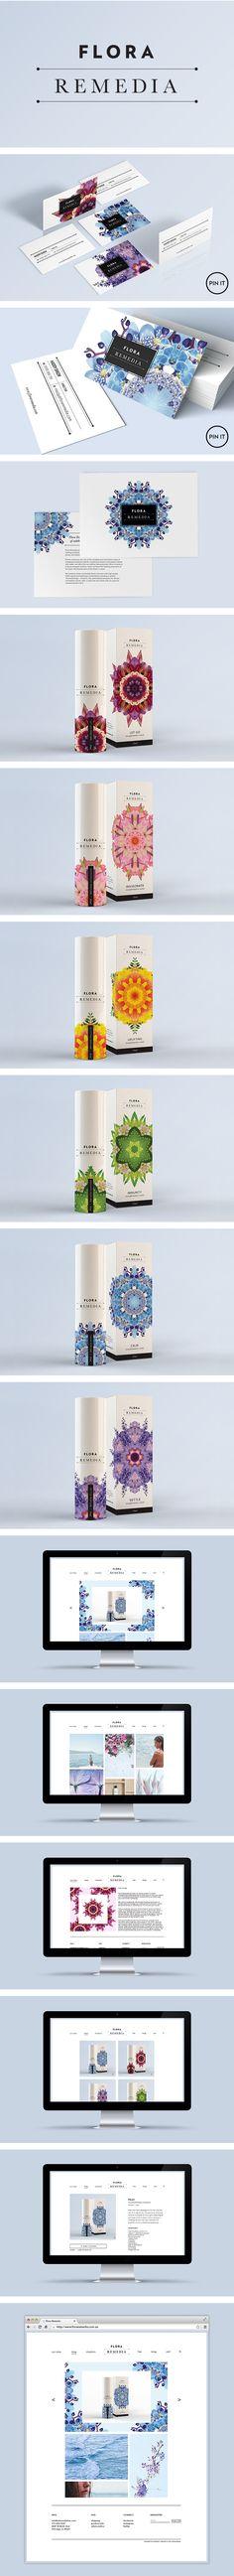 Flora Remedia branding by Smack Bang Designs #Branding #BusinessCards…